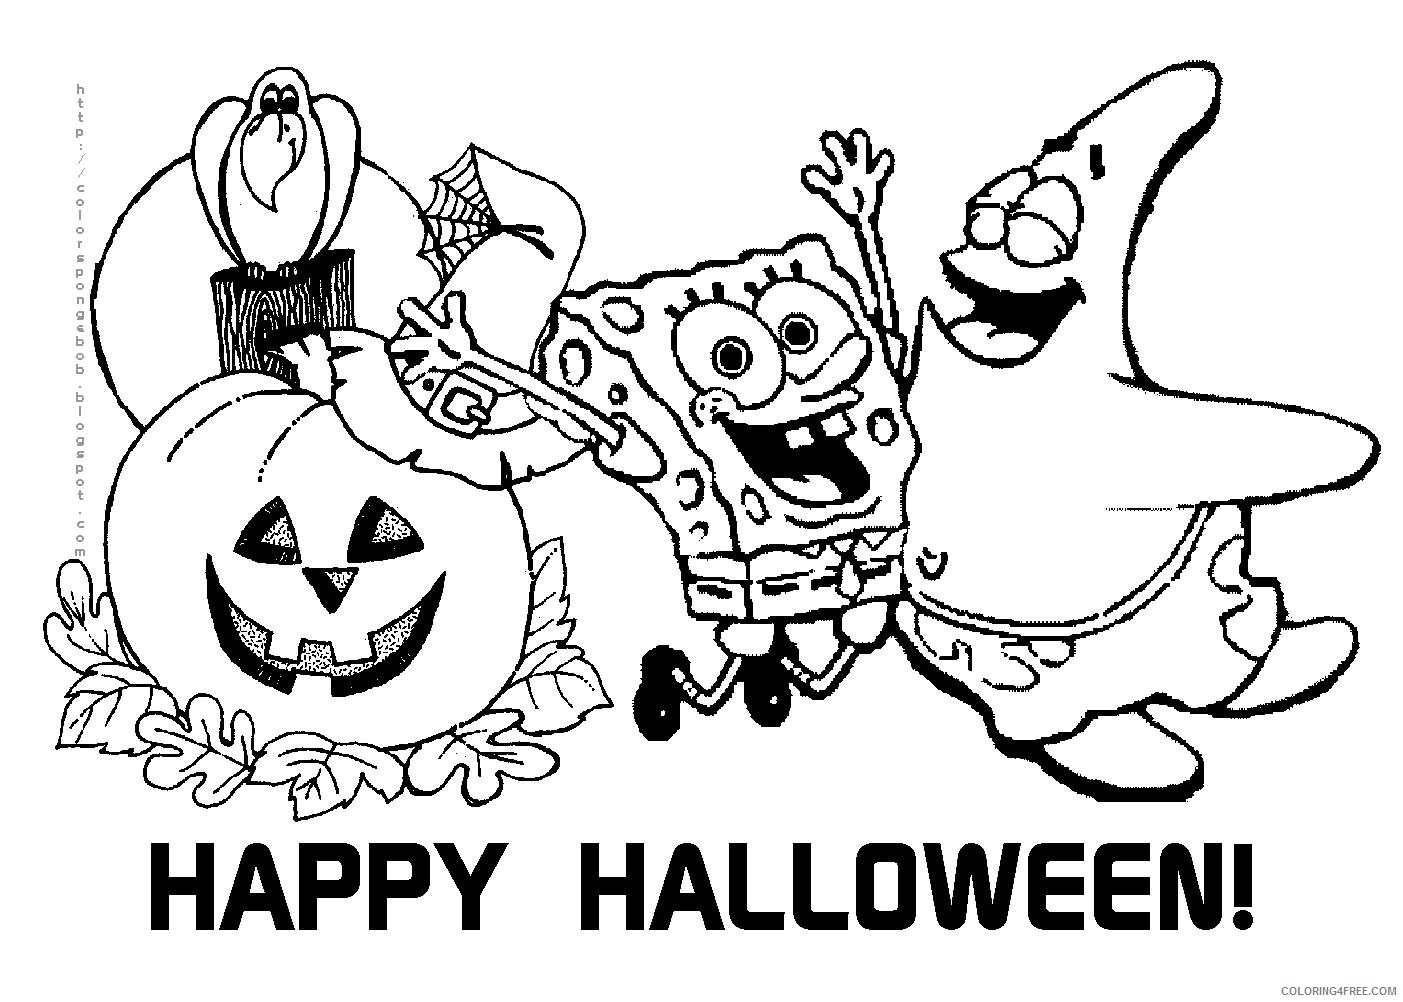 spongebob squarepants coloring pages halloween Coloring4free